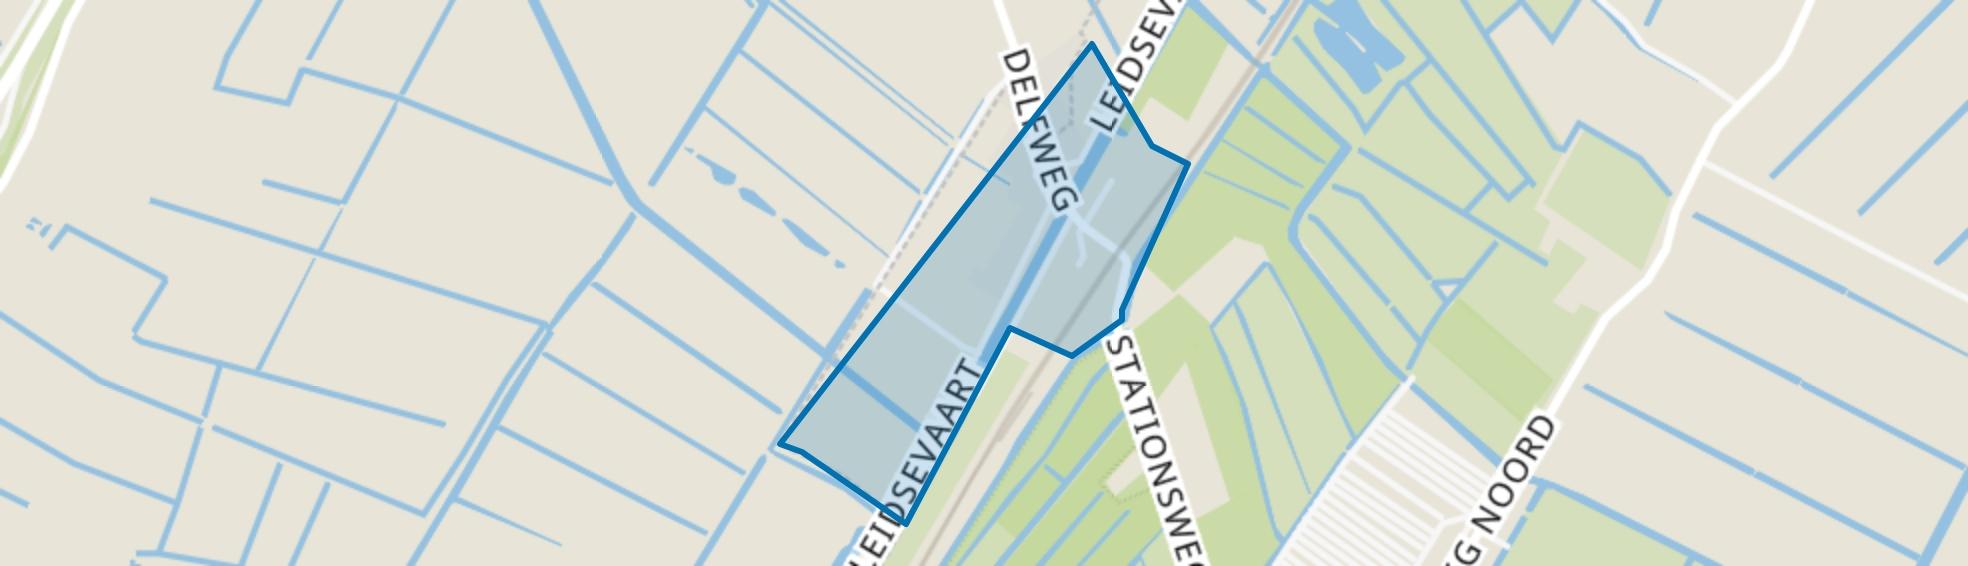 Halfweg, Lisse map